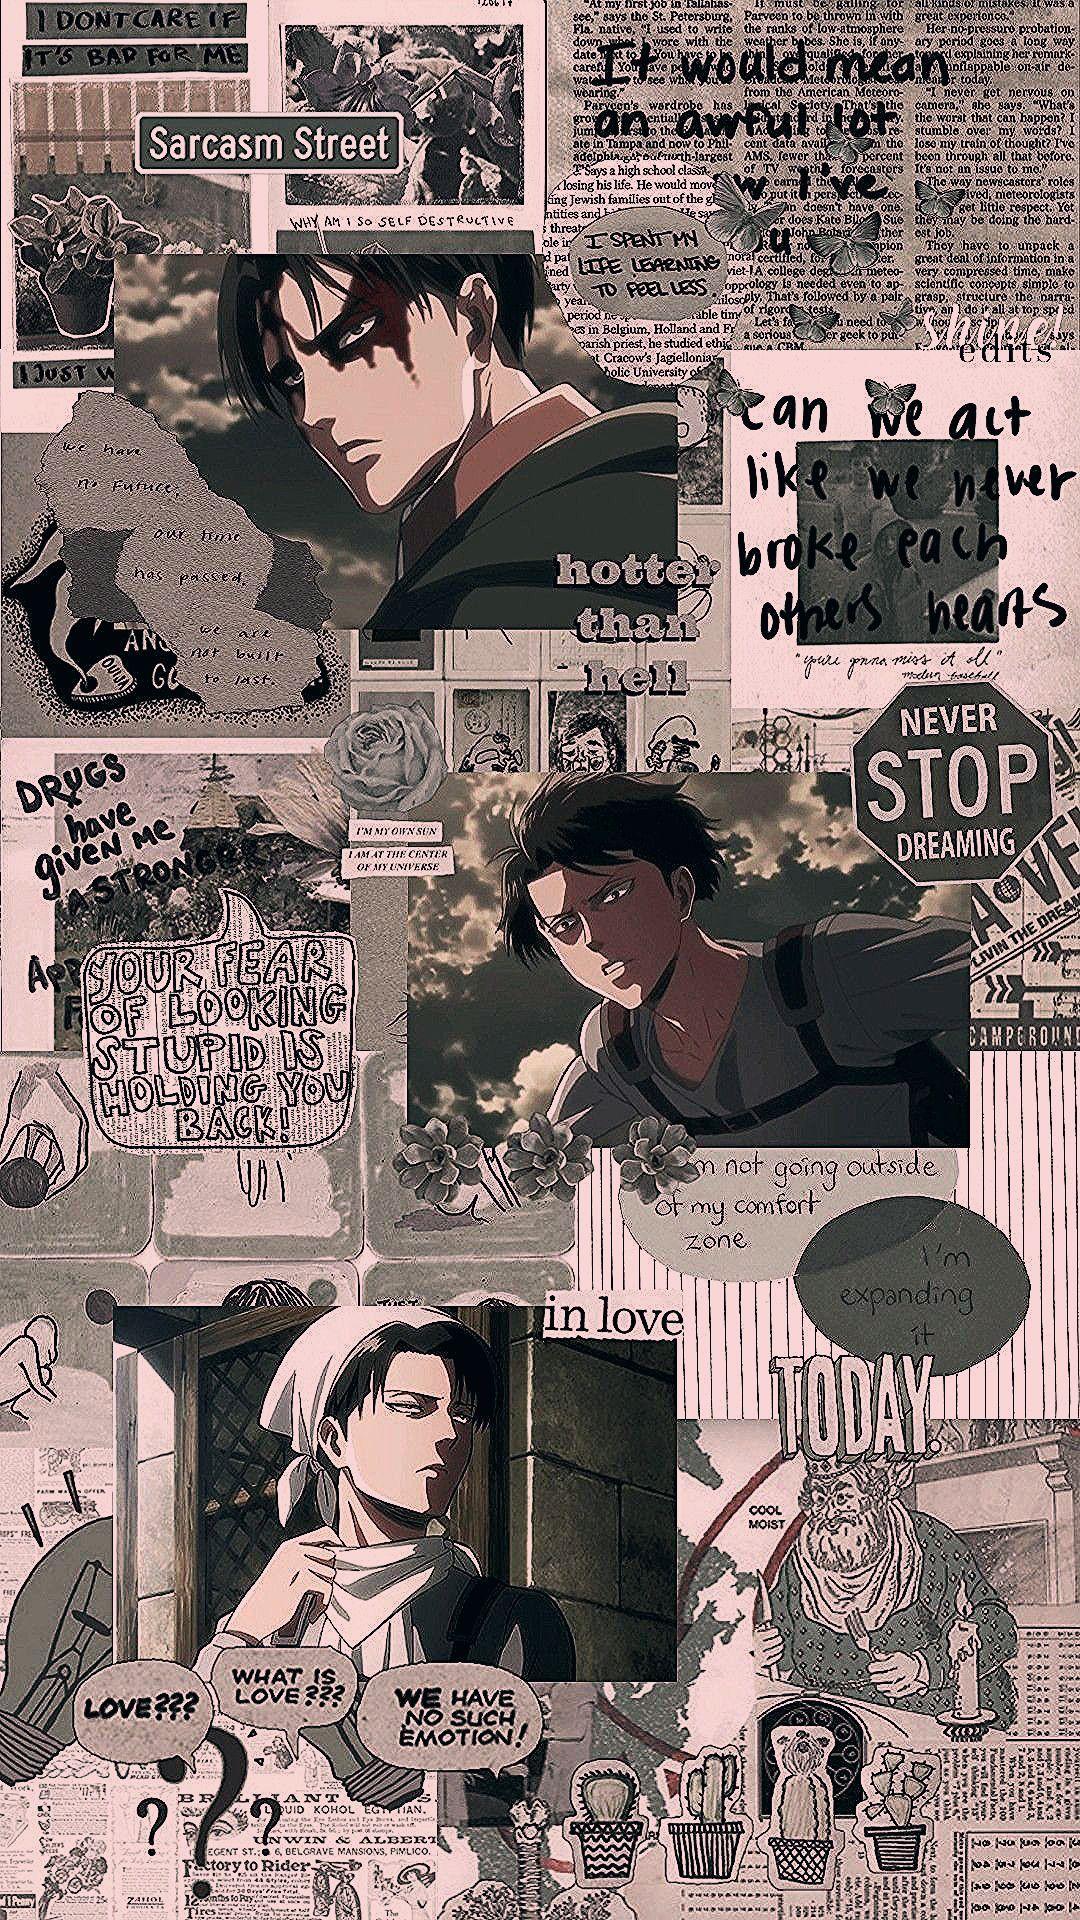 Shingeki No Kyojin Levi Ackerman Anime Wallpaper Iphone Cute Anime Wallpaper Anime Backgrounds Wallpapers